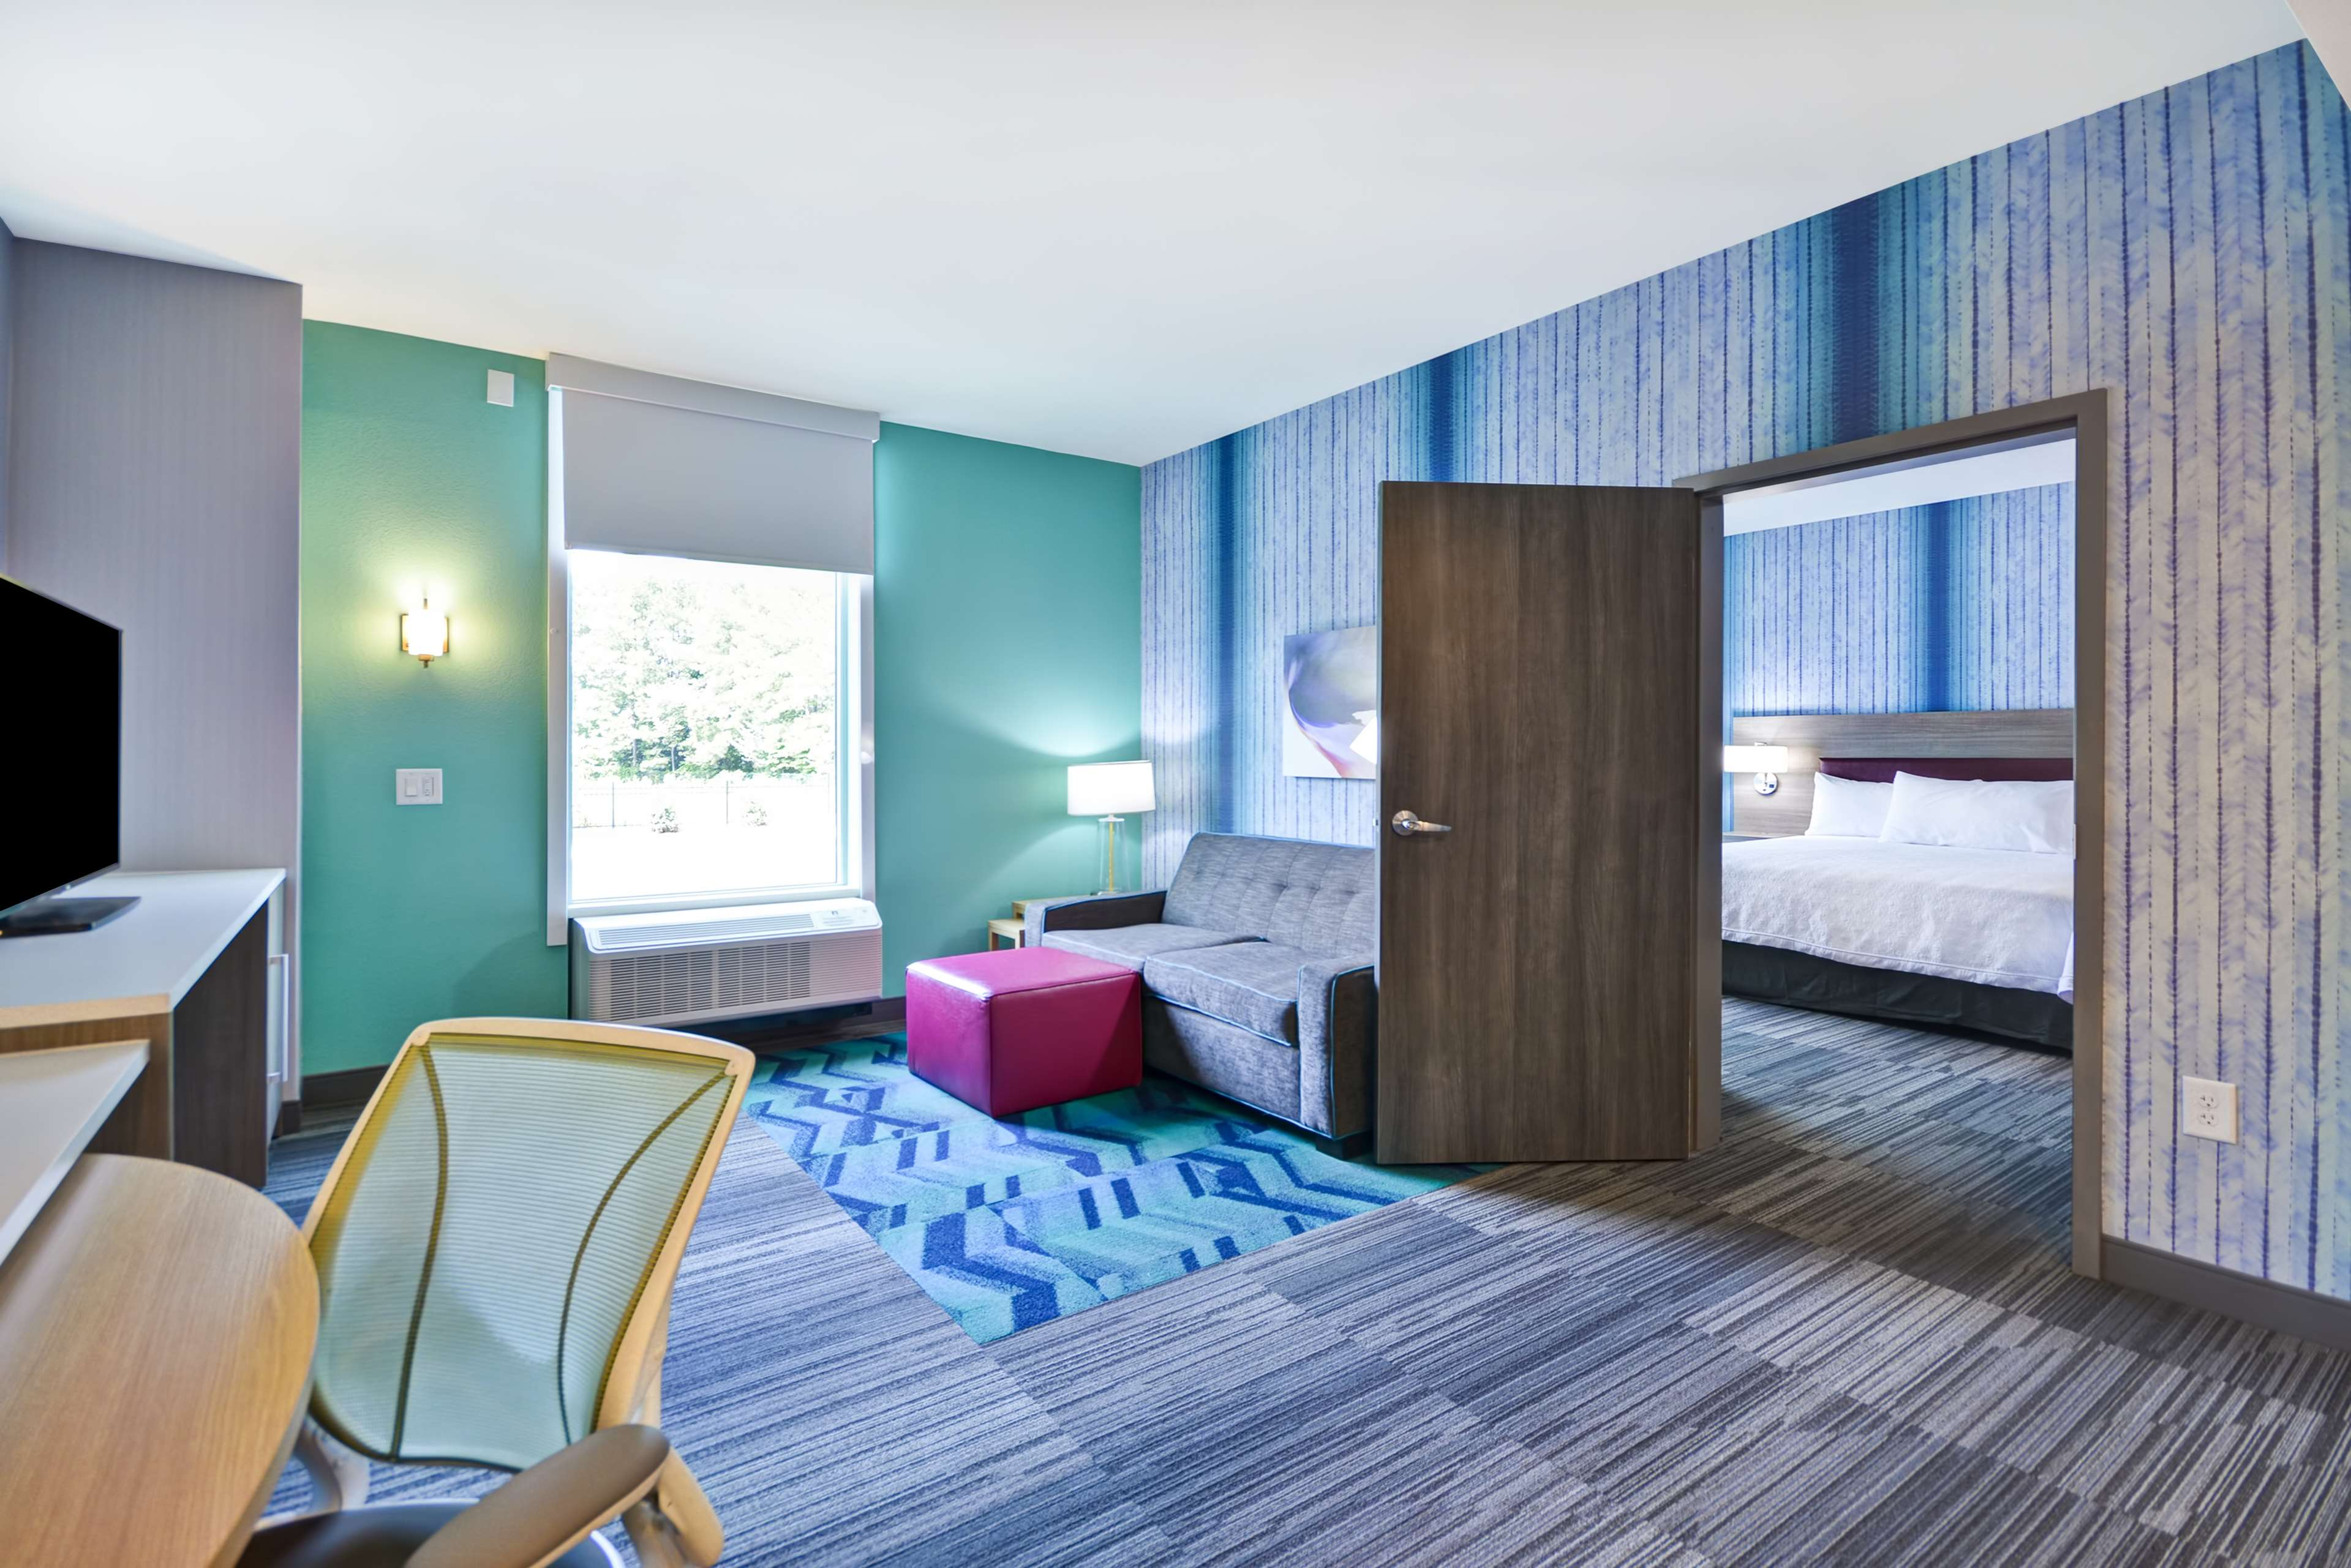 Home2 Suites by Hilton Atlanta West Lithia Springs image 36